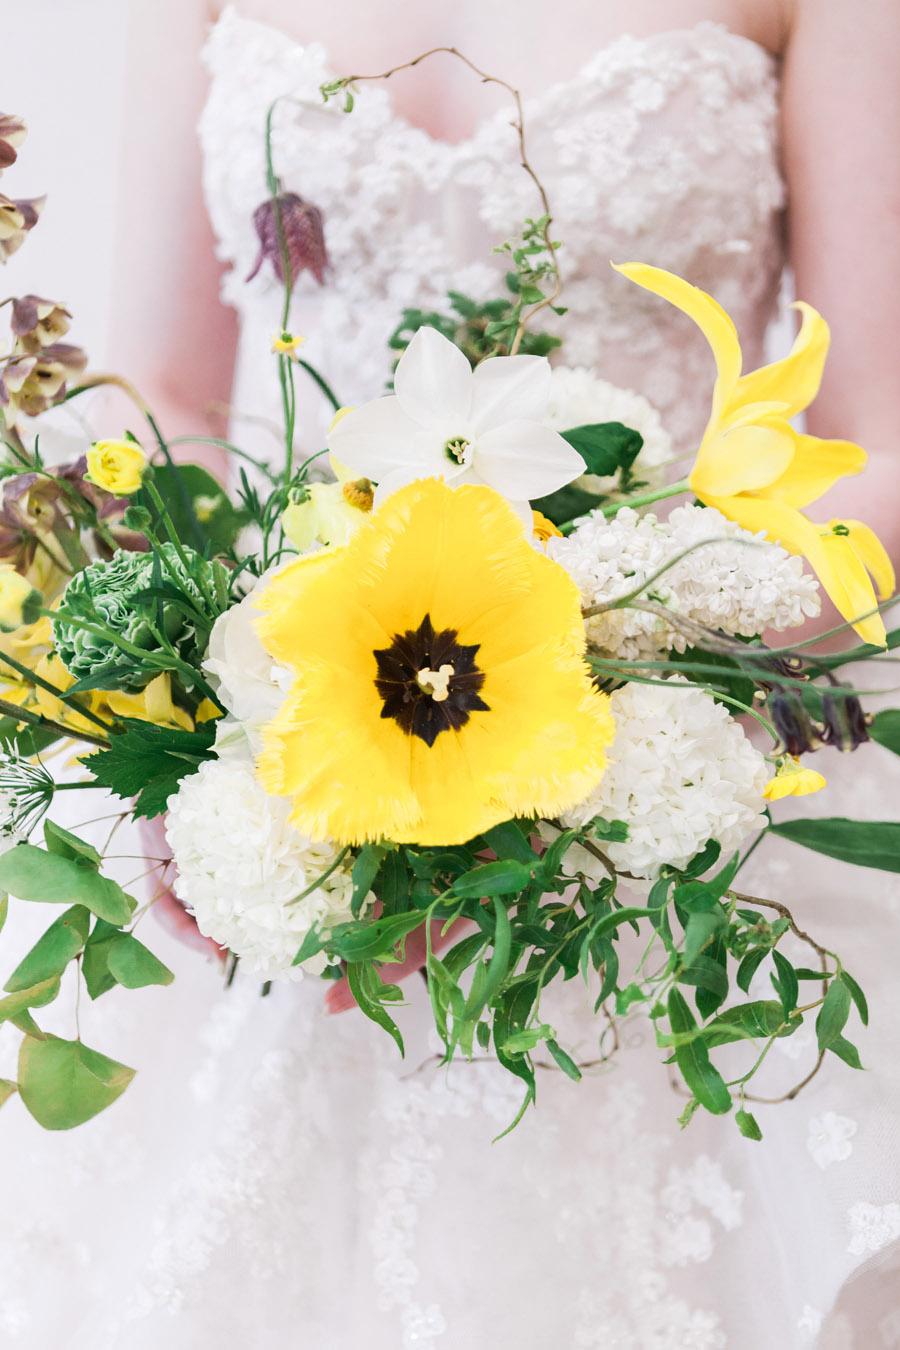 Glorious yellow Bloomologie blooms and styling by Chenai - photo credit Amanda Karen Photography (3)